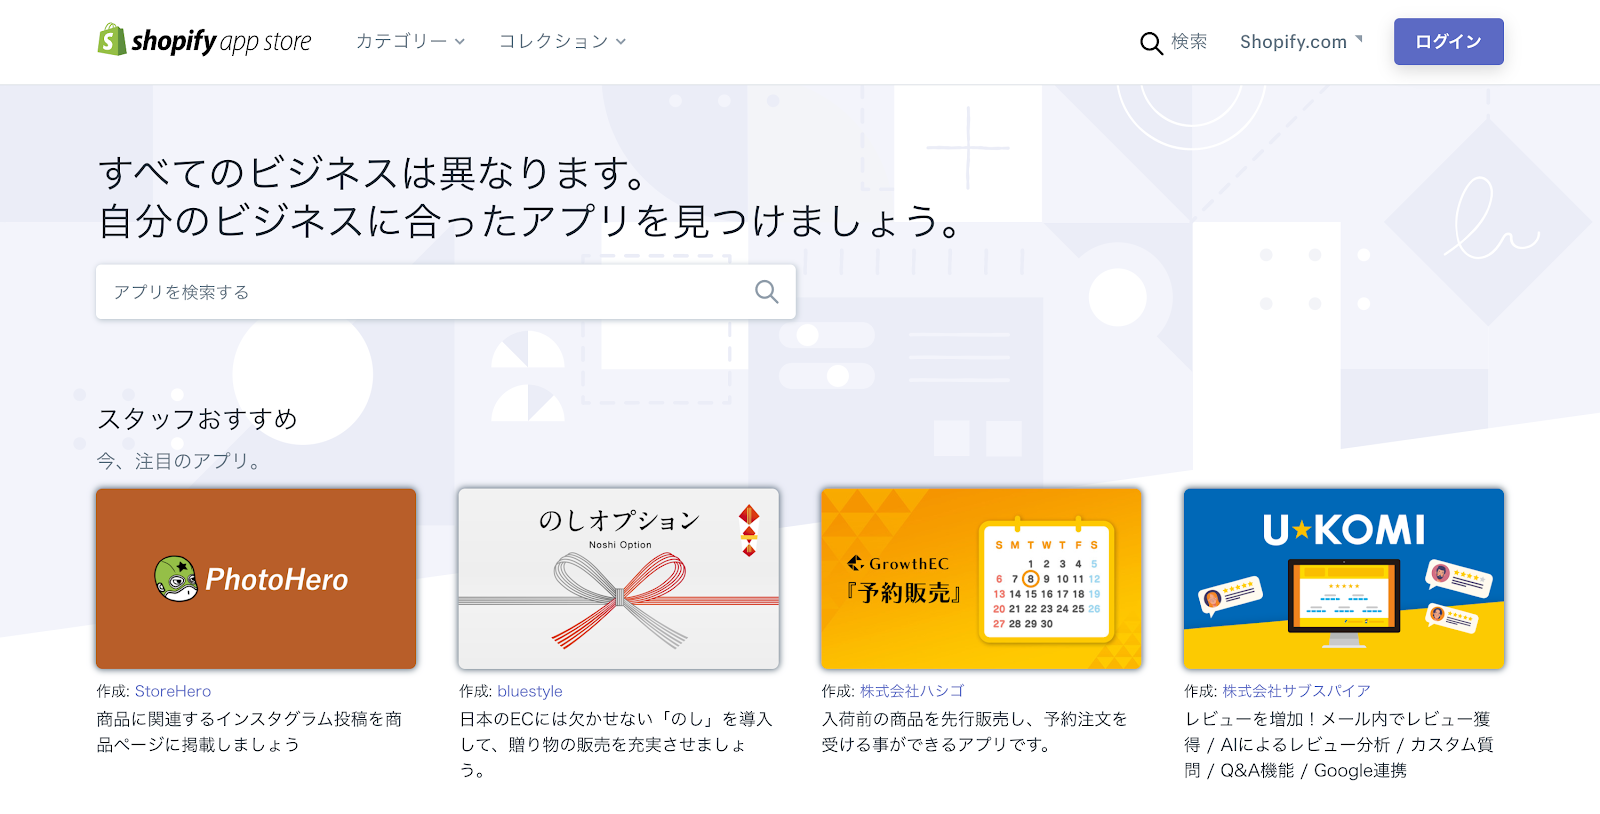 Shoify app store公式ページ